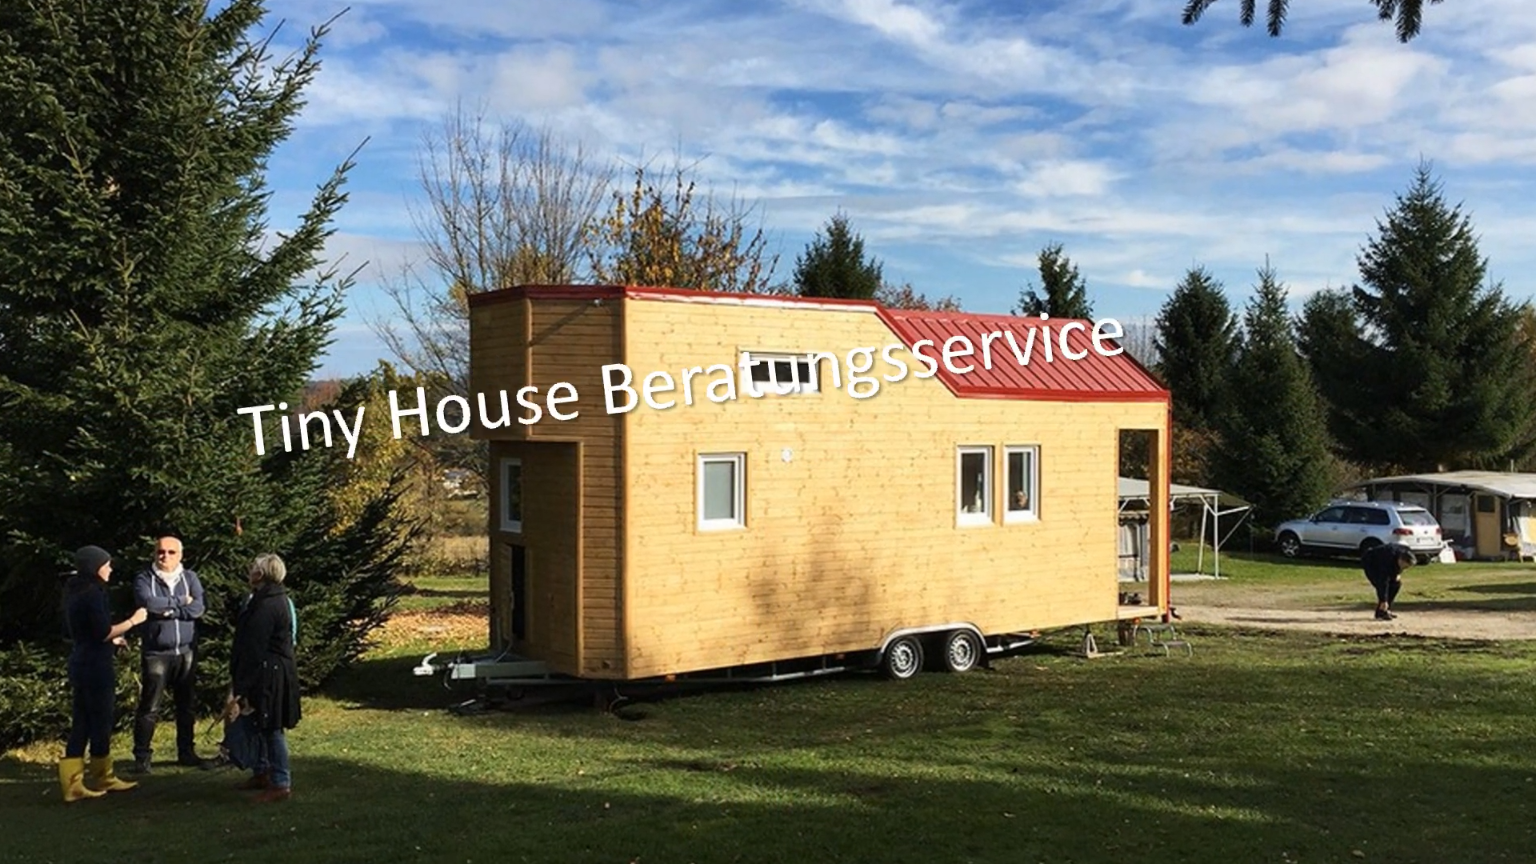 Serienmäßig lassen auch sie sich dem tiny house begeistern serienmäßig